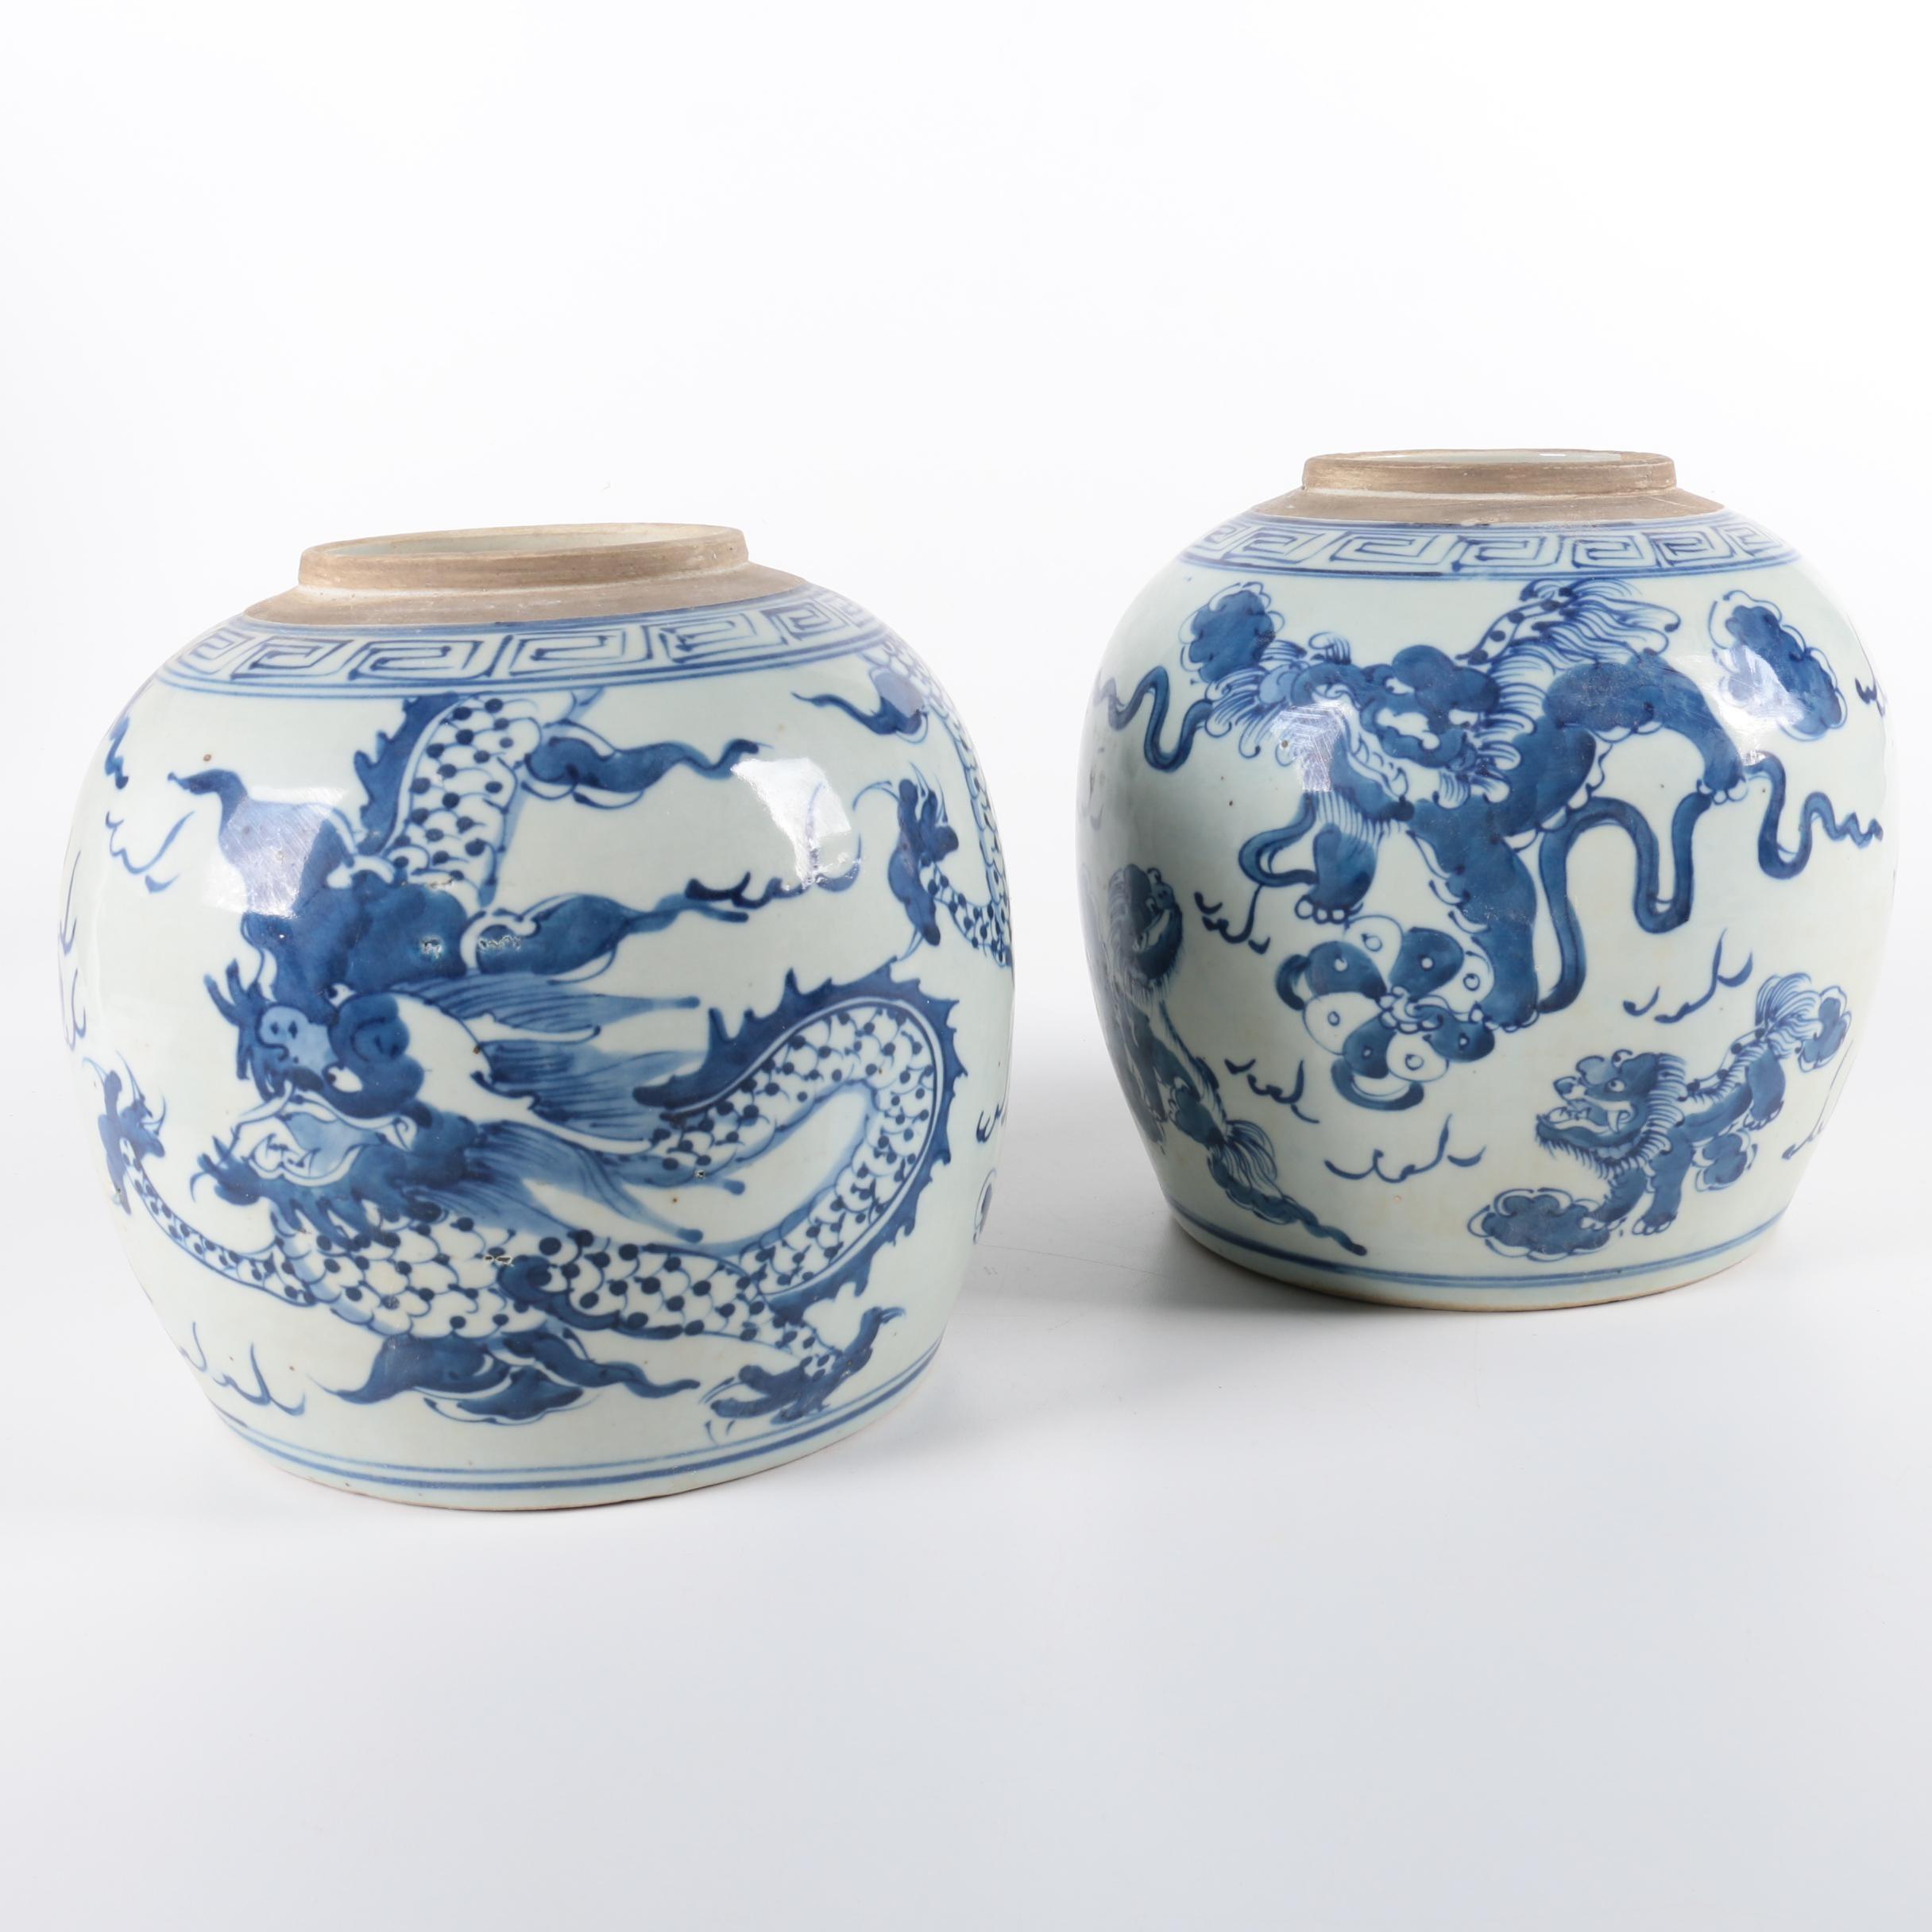 Chinese Blue and White Ceramic Ginger Jars